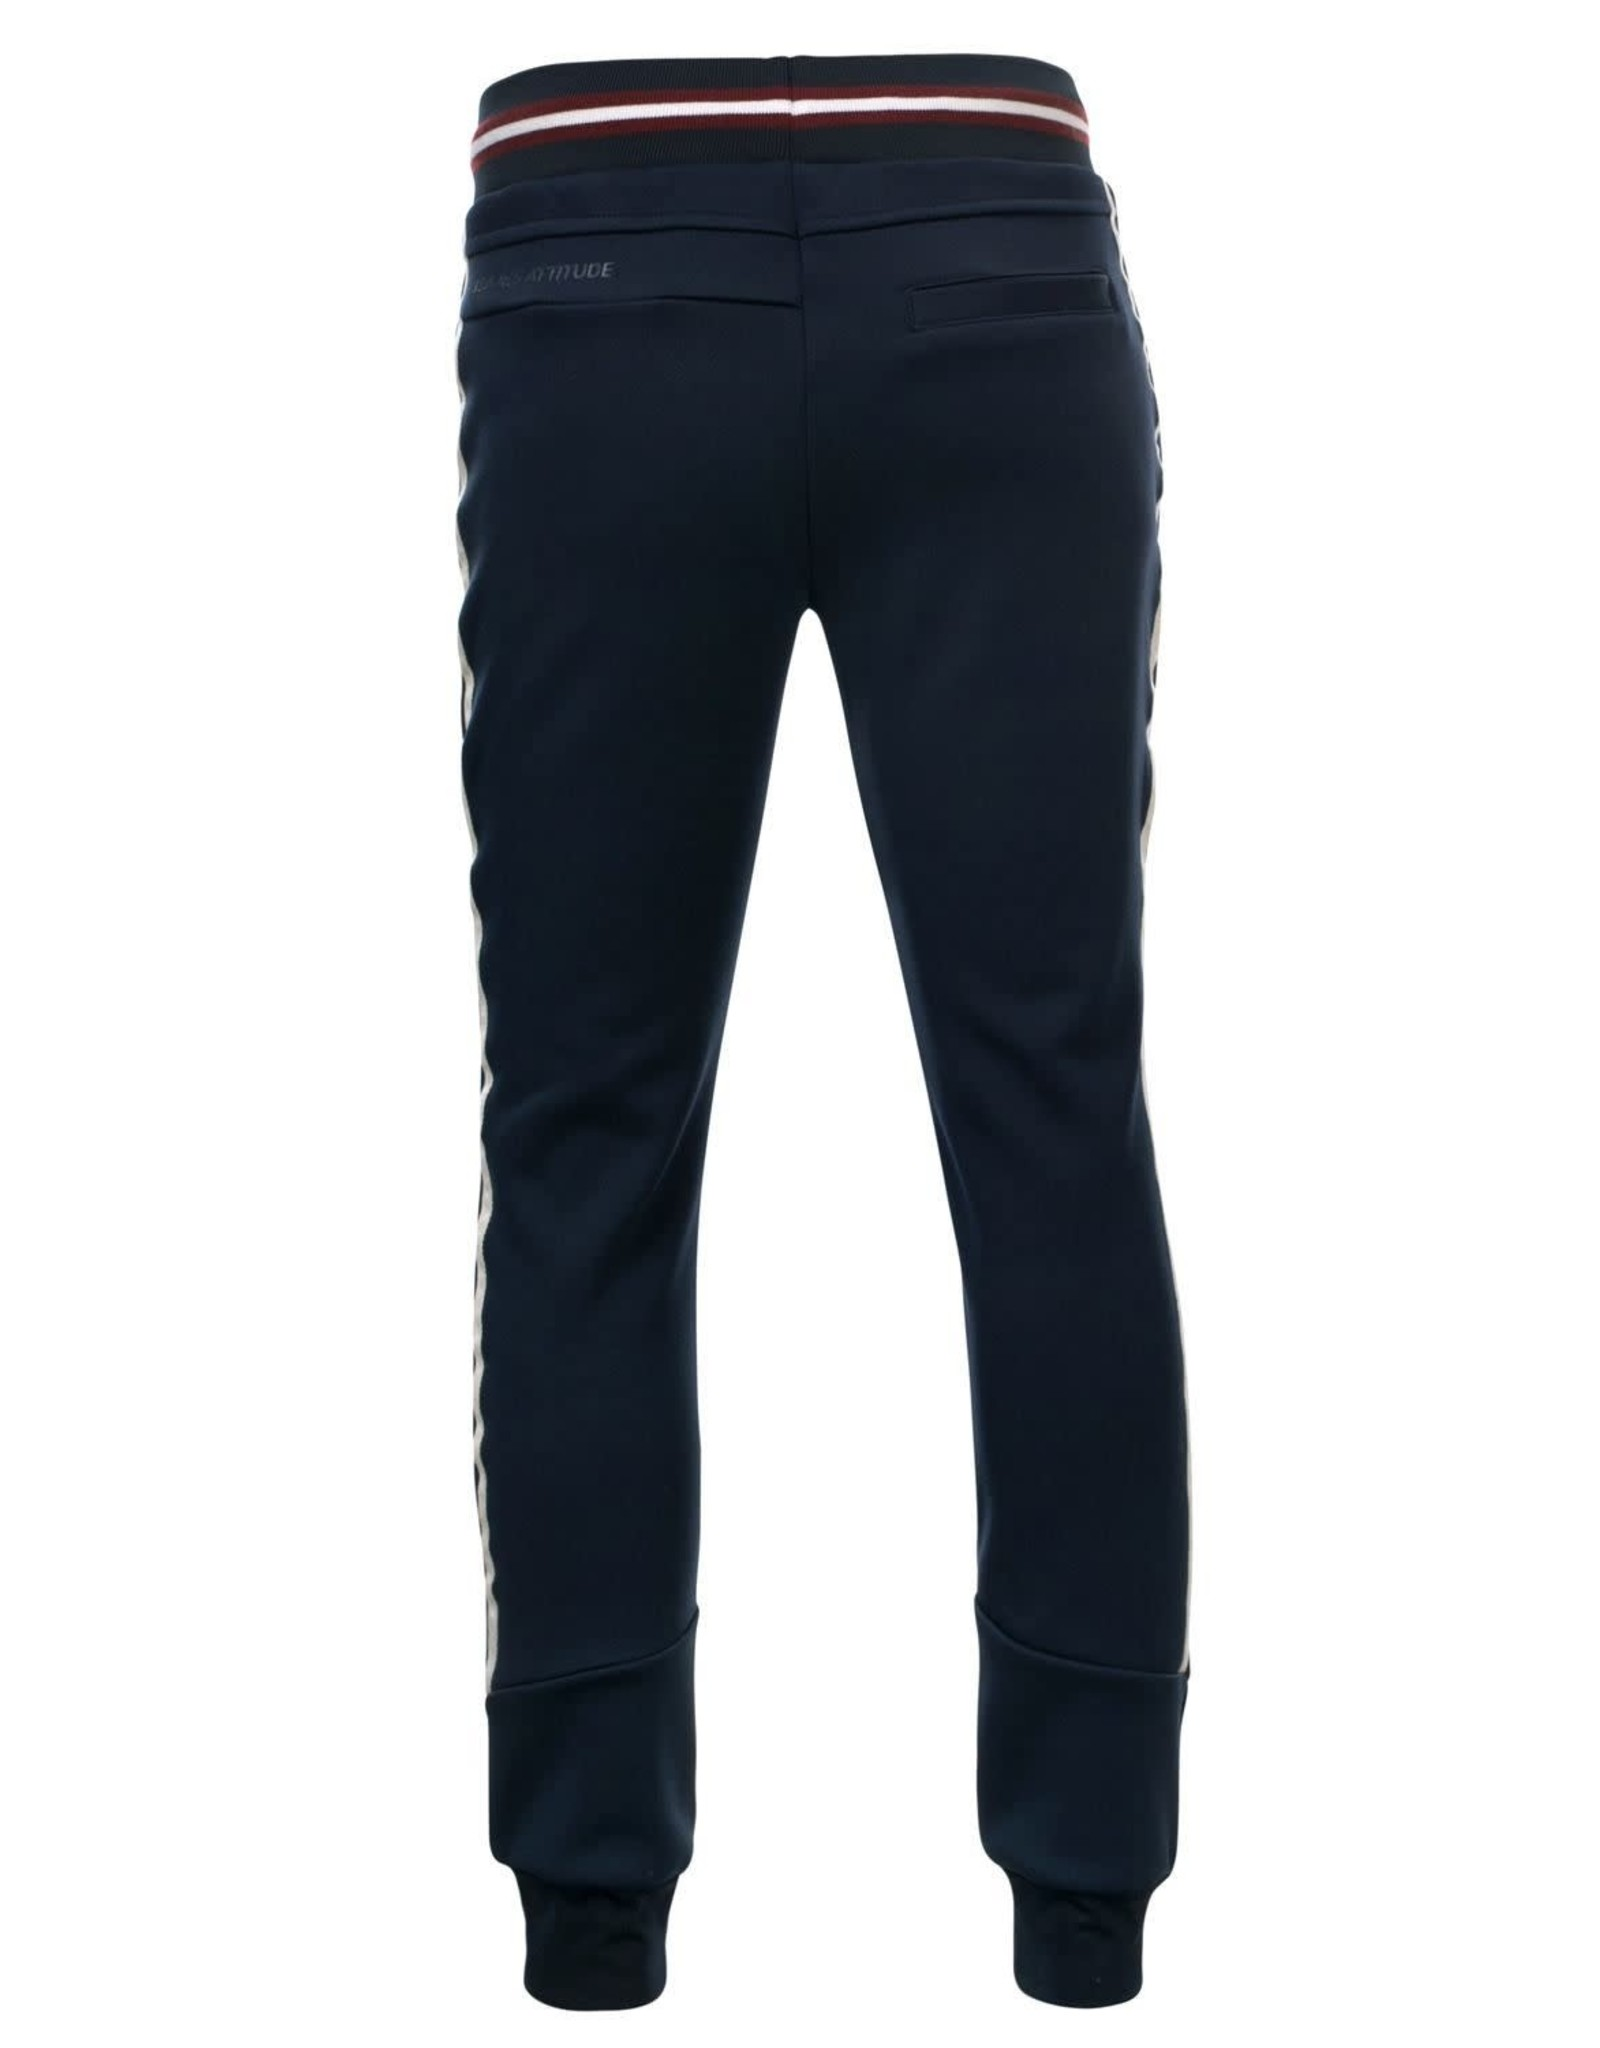 Common Heroes 2031-8621 Pants